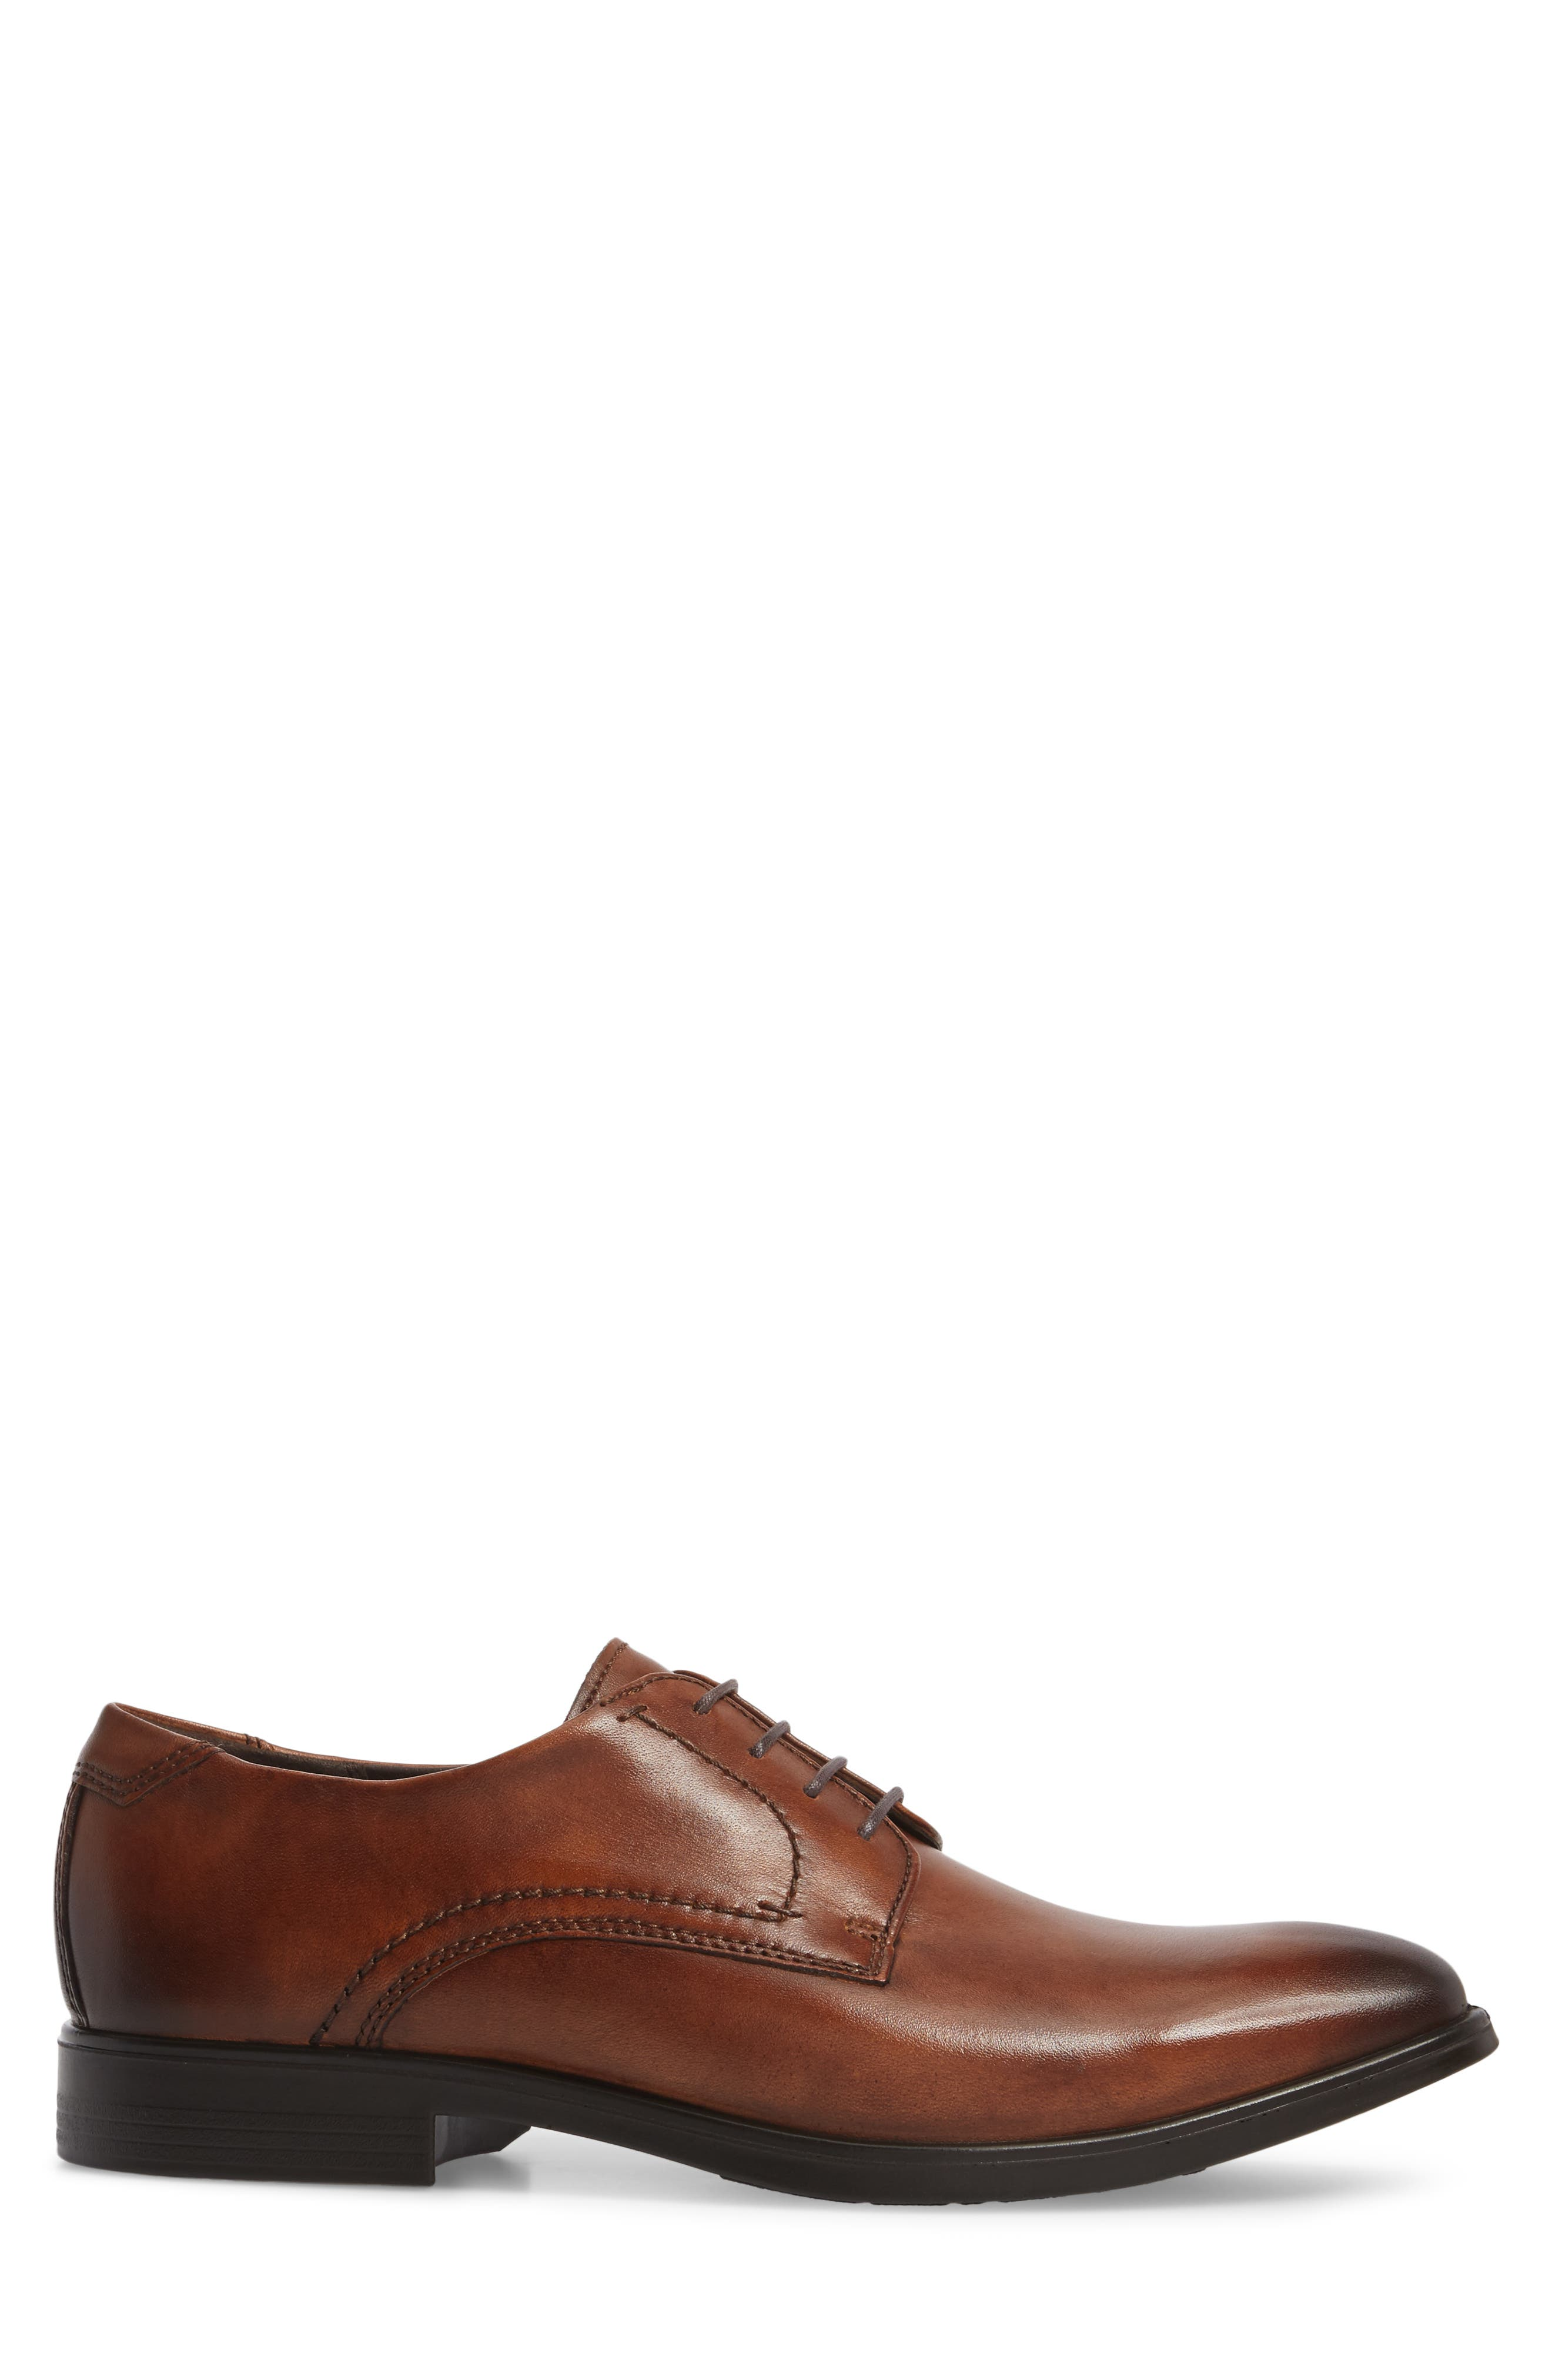 Melbourne Plain Toe Derby,                             Alternate thumbnail 3, color,                             Amber Leather